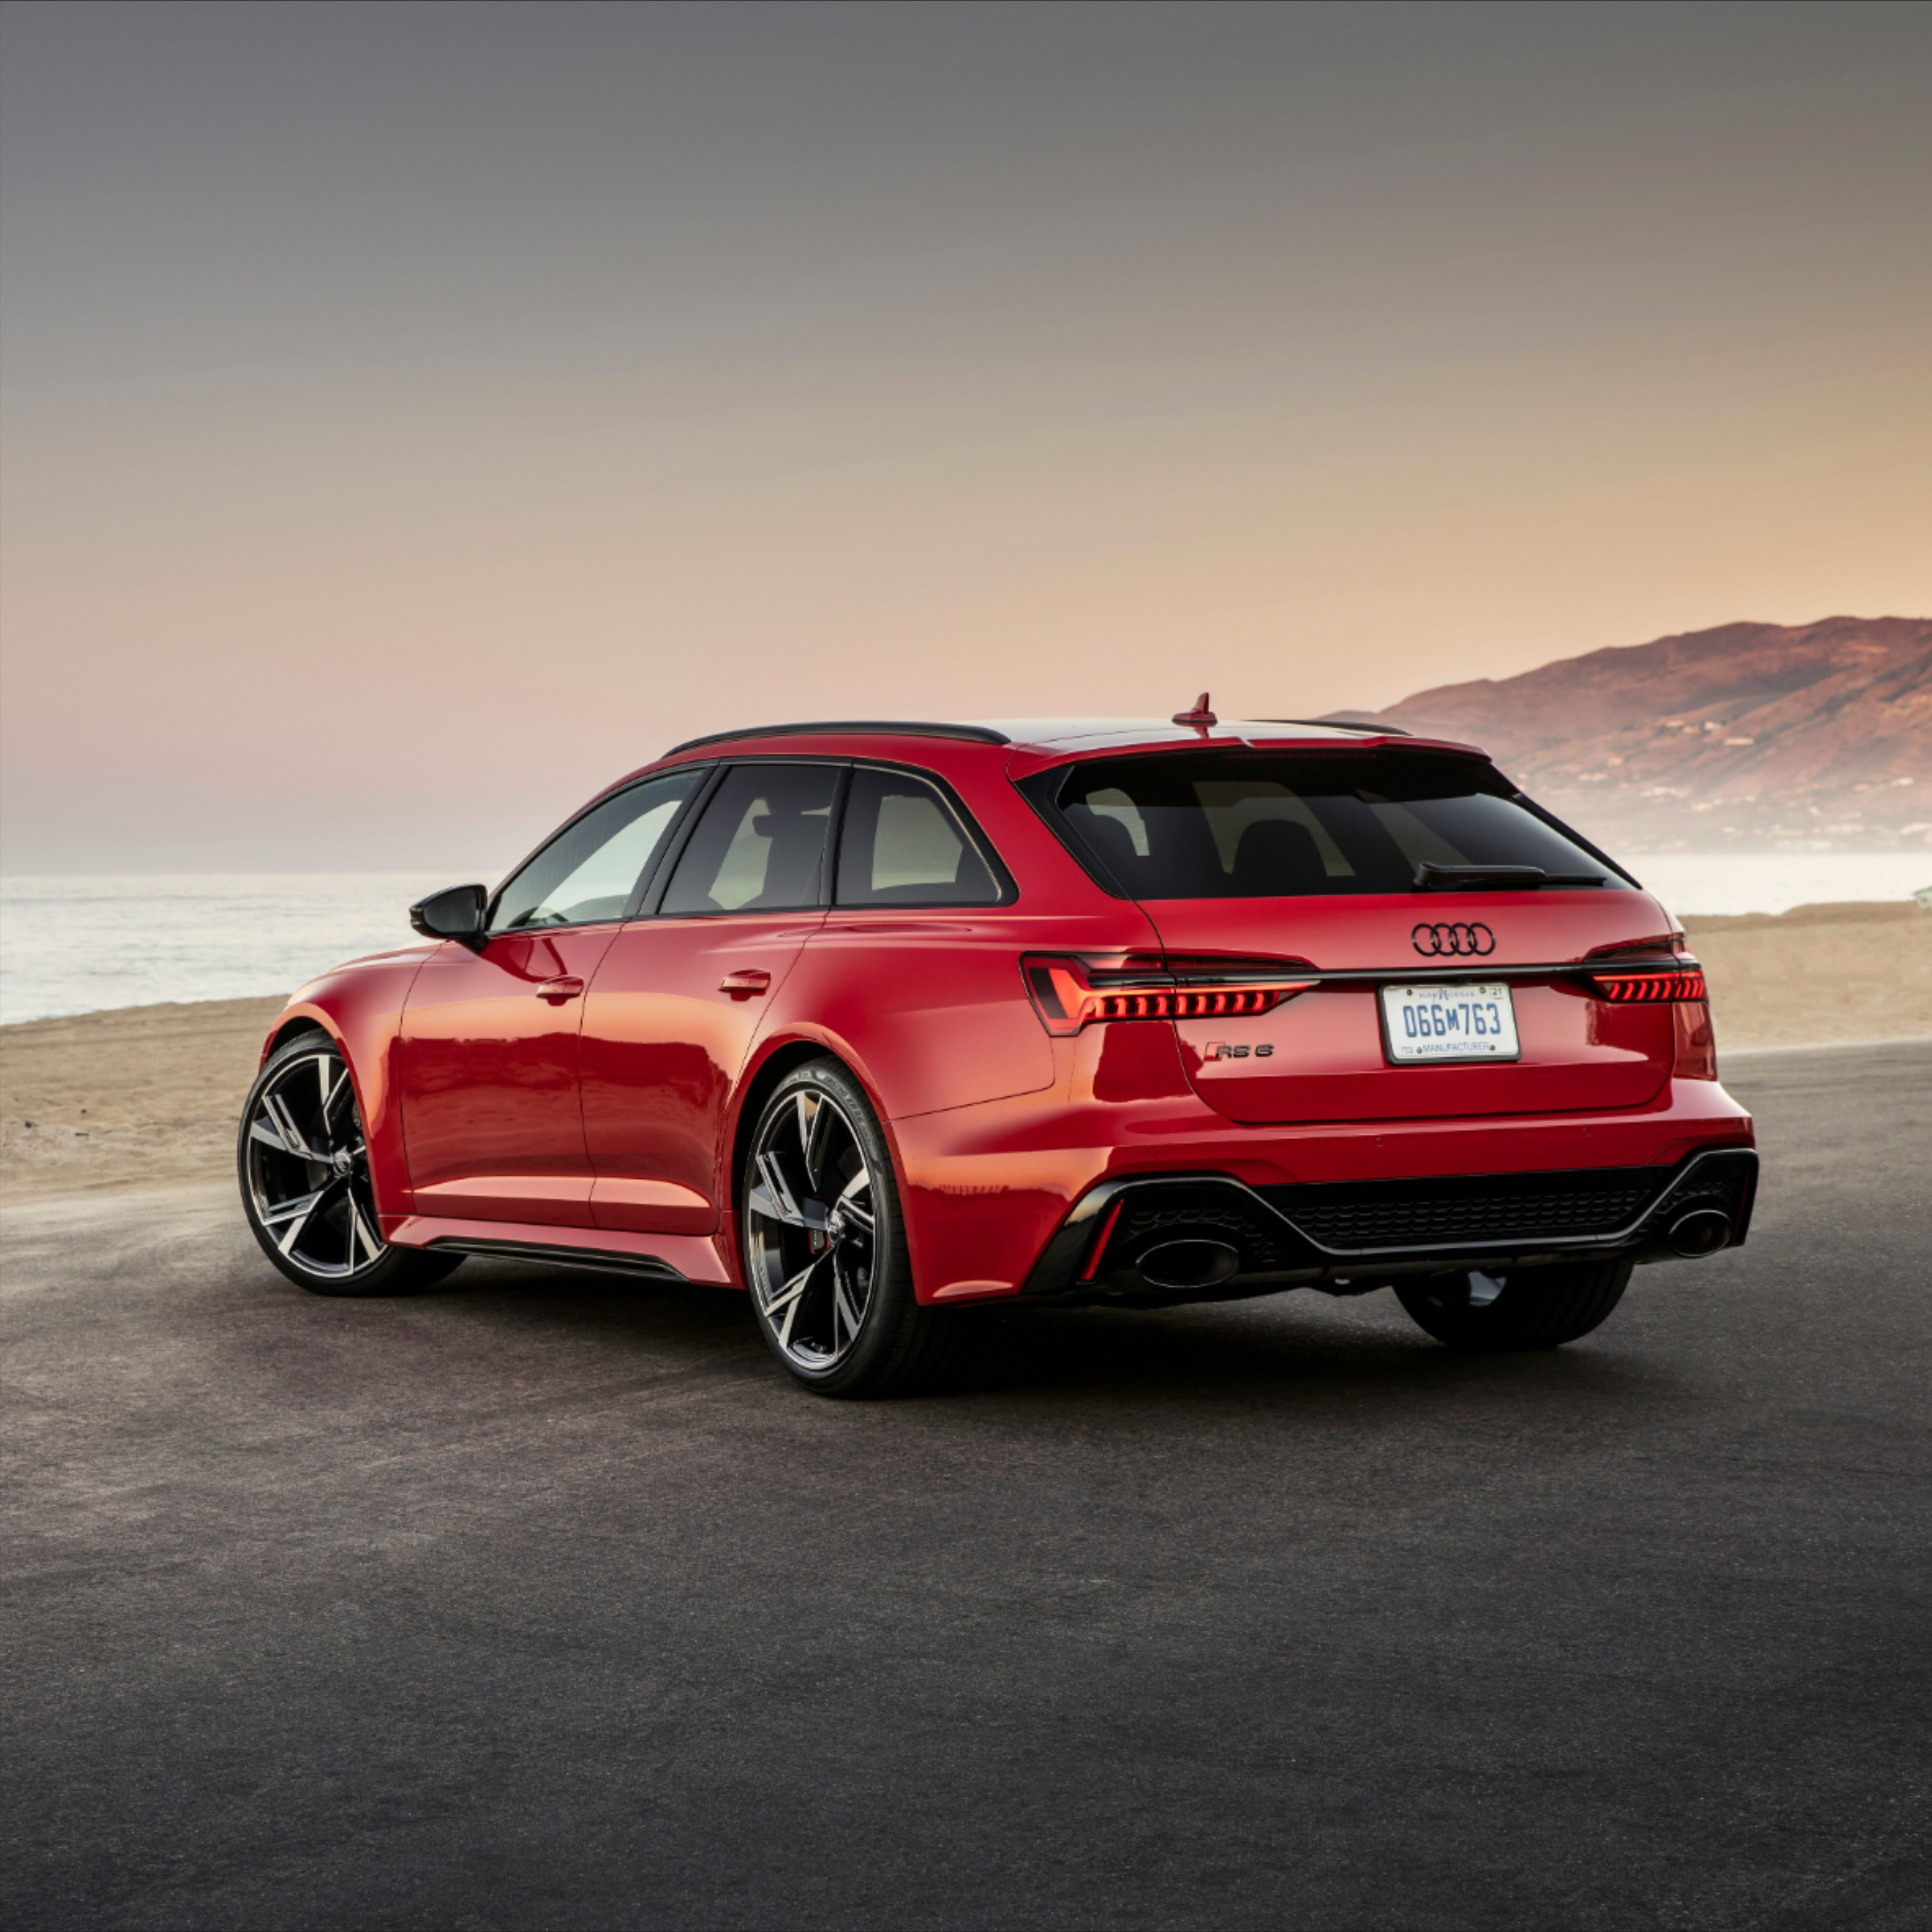 Audi Rs 6 Avant In 2020 Audi Rs Audi Rs6 Audi